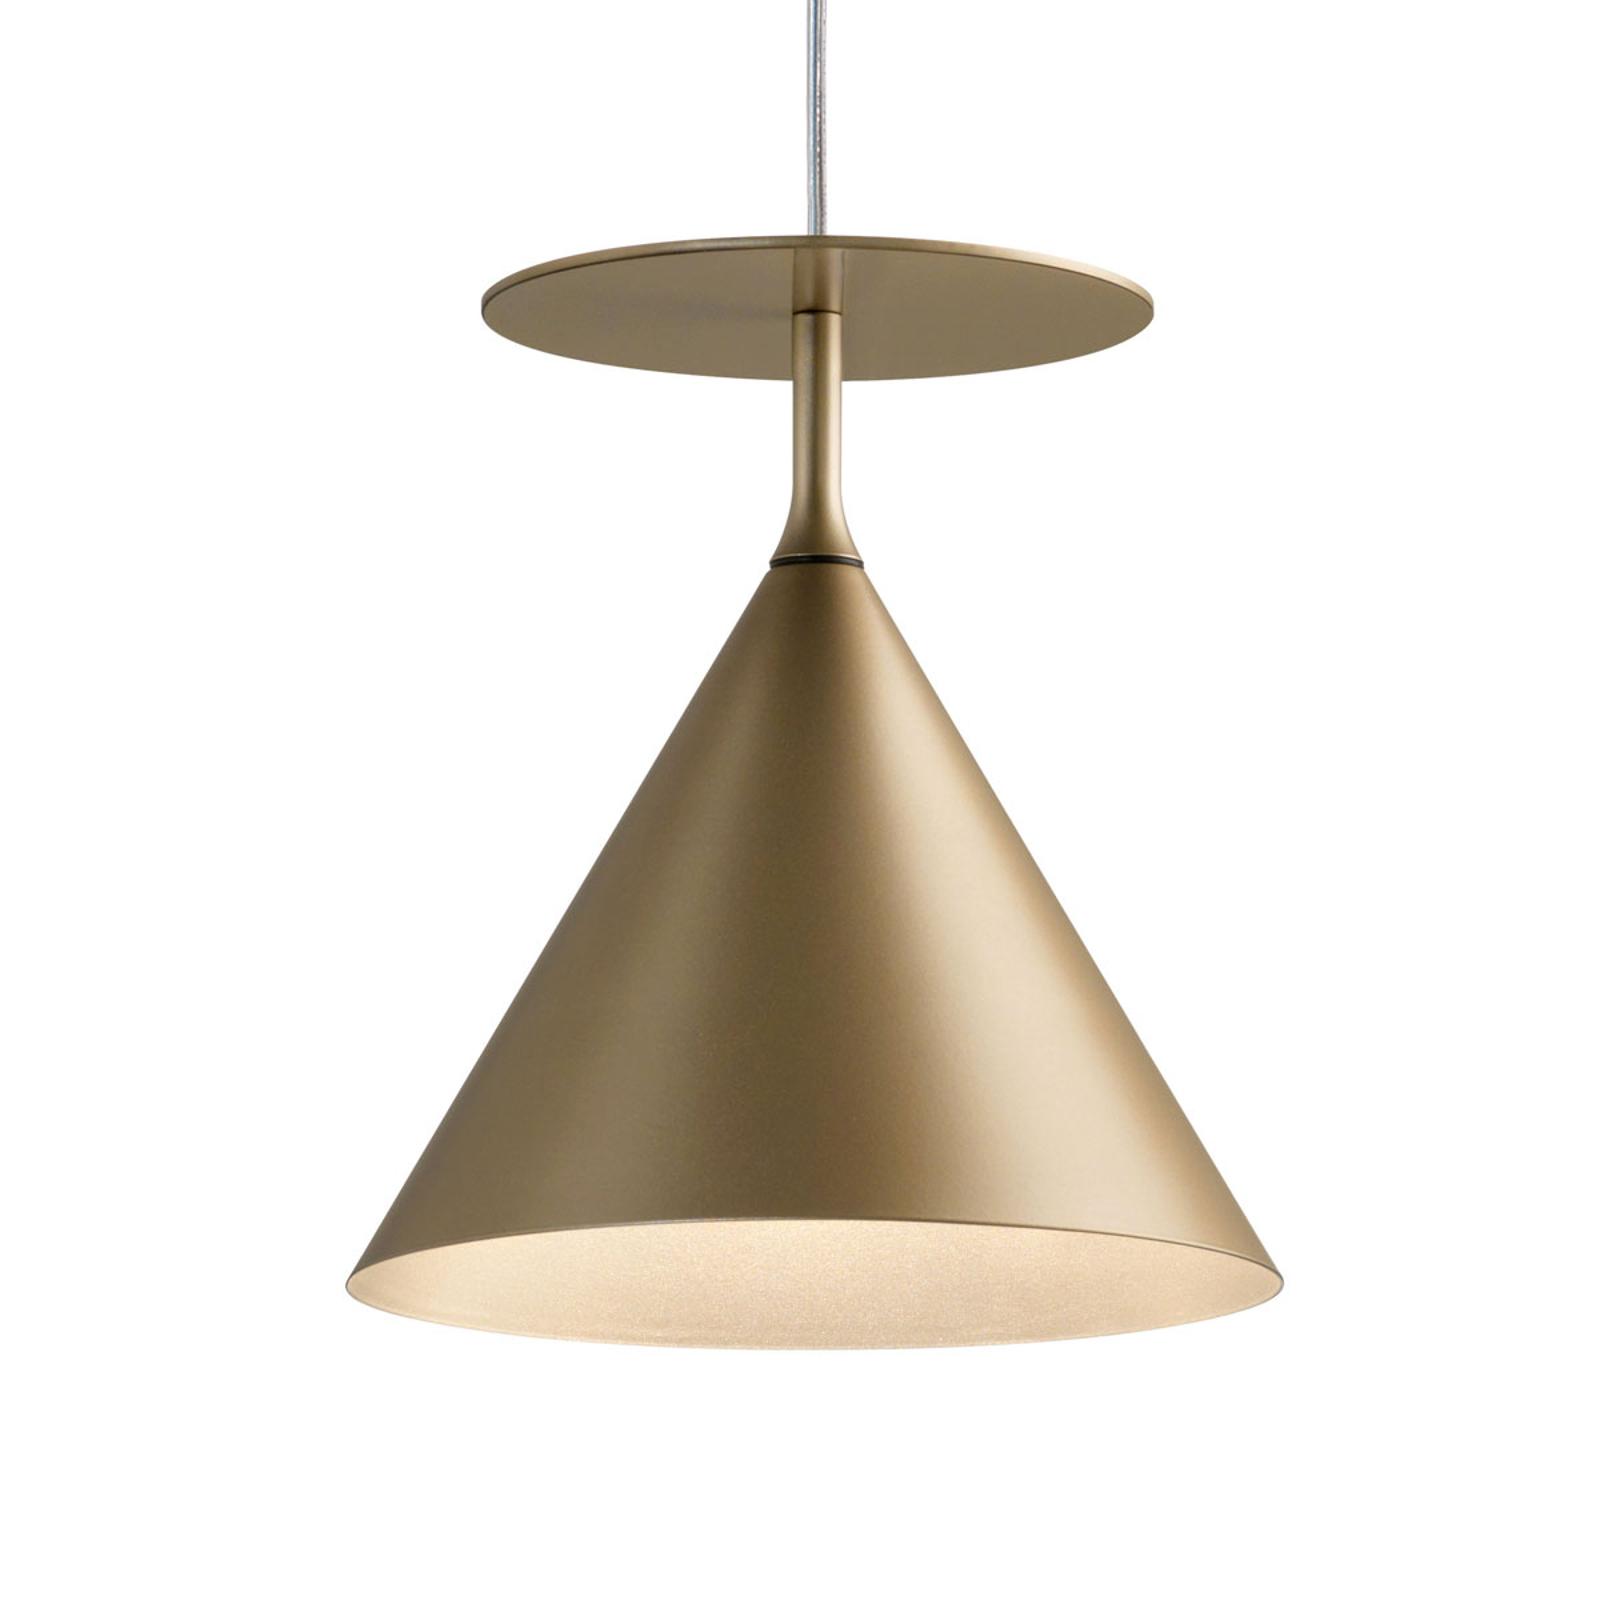 Modo Luce ABC Single C hanglamp mat goud